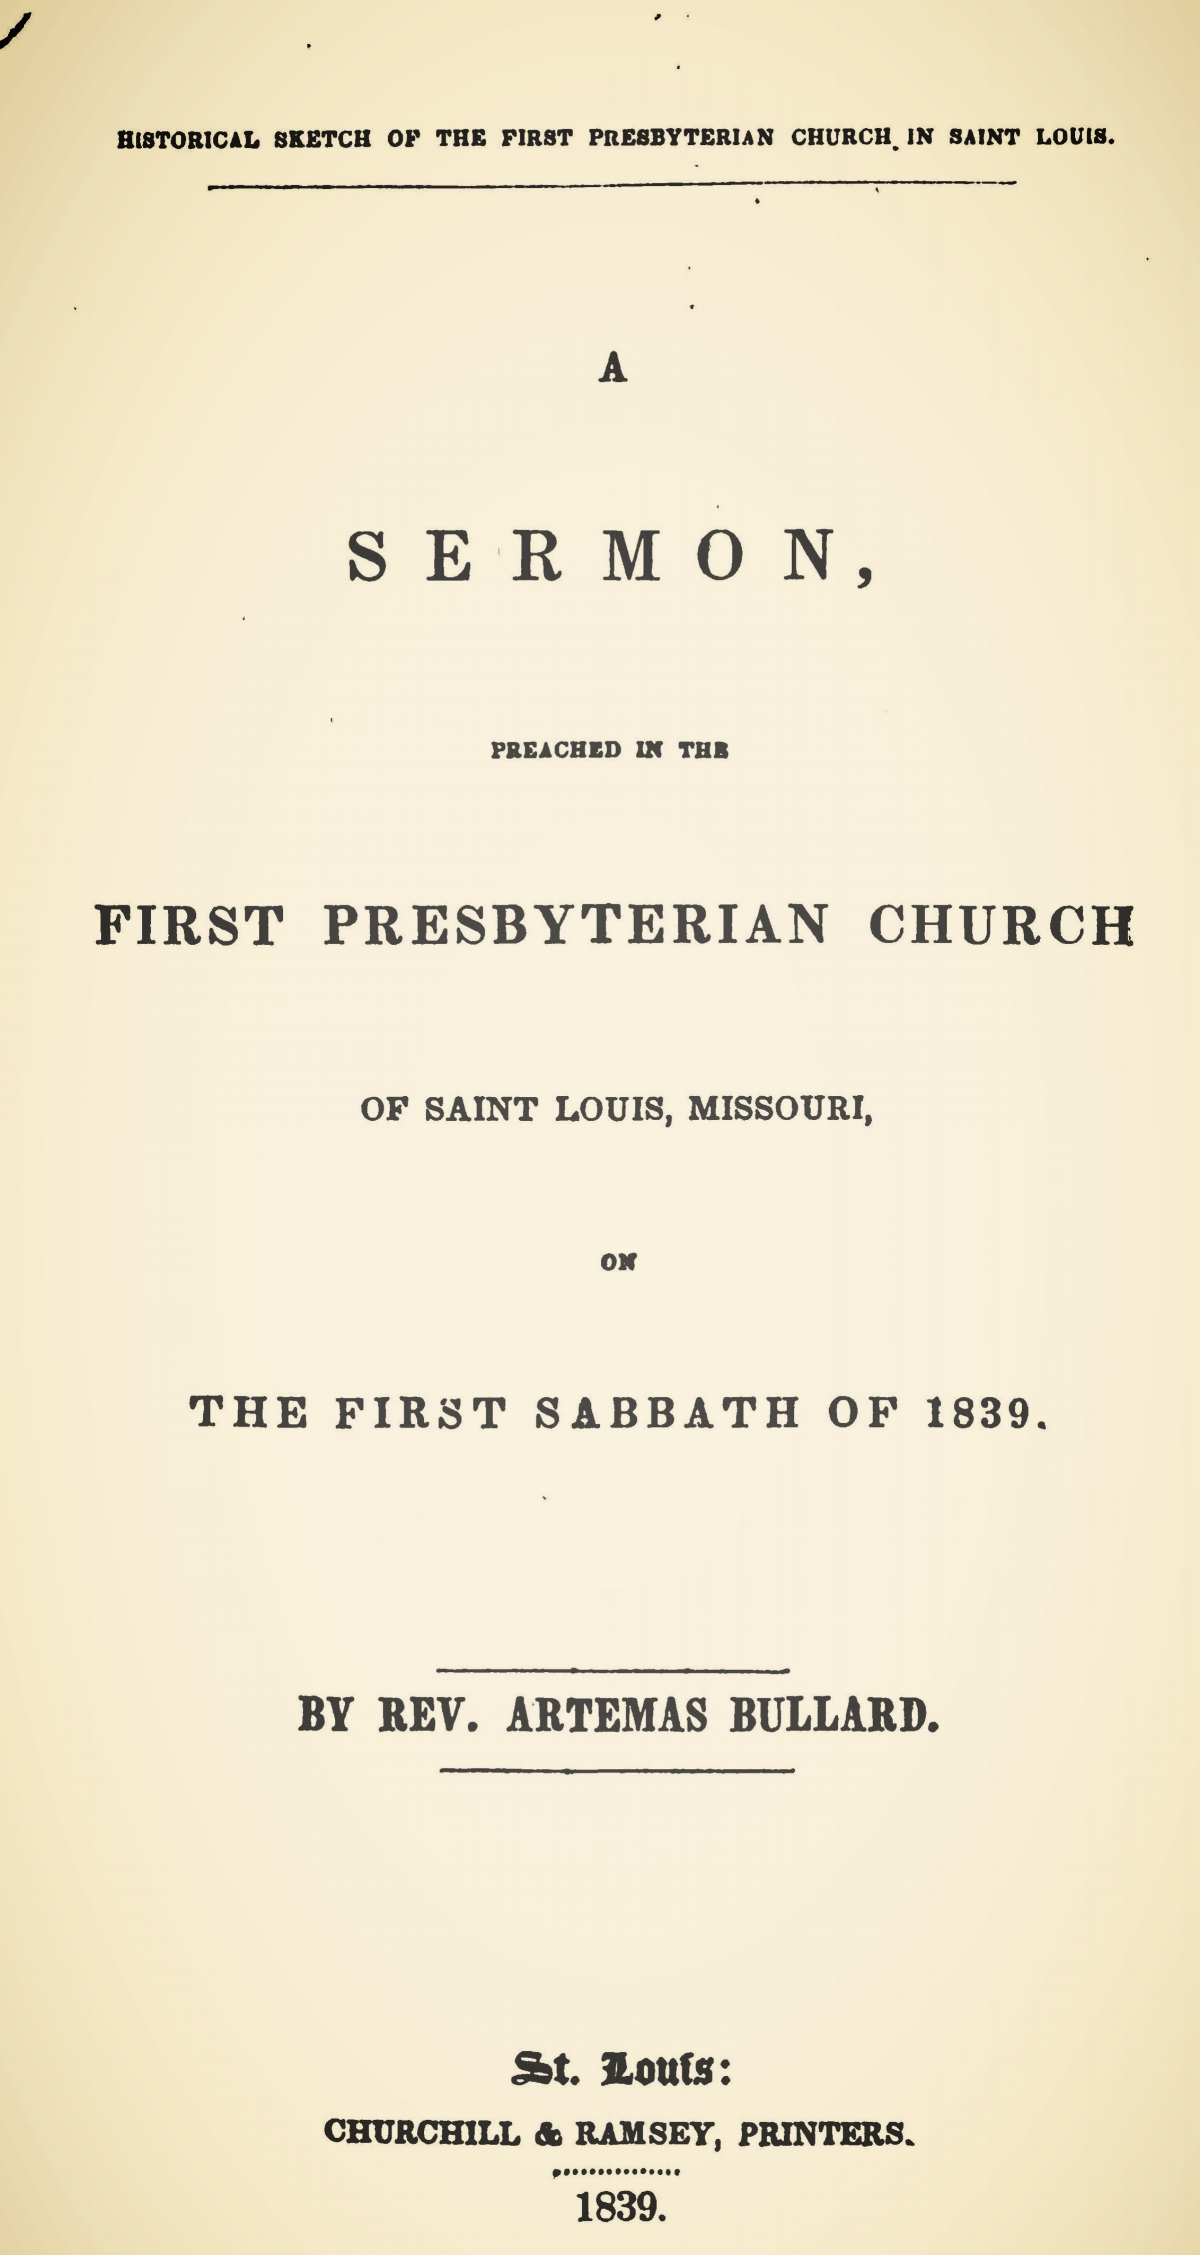 Bullard, Jr., Artemas, Historical Sketch of the First Presbyterian Church in Saint Louis Title Page.jpg